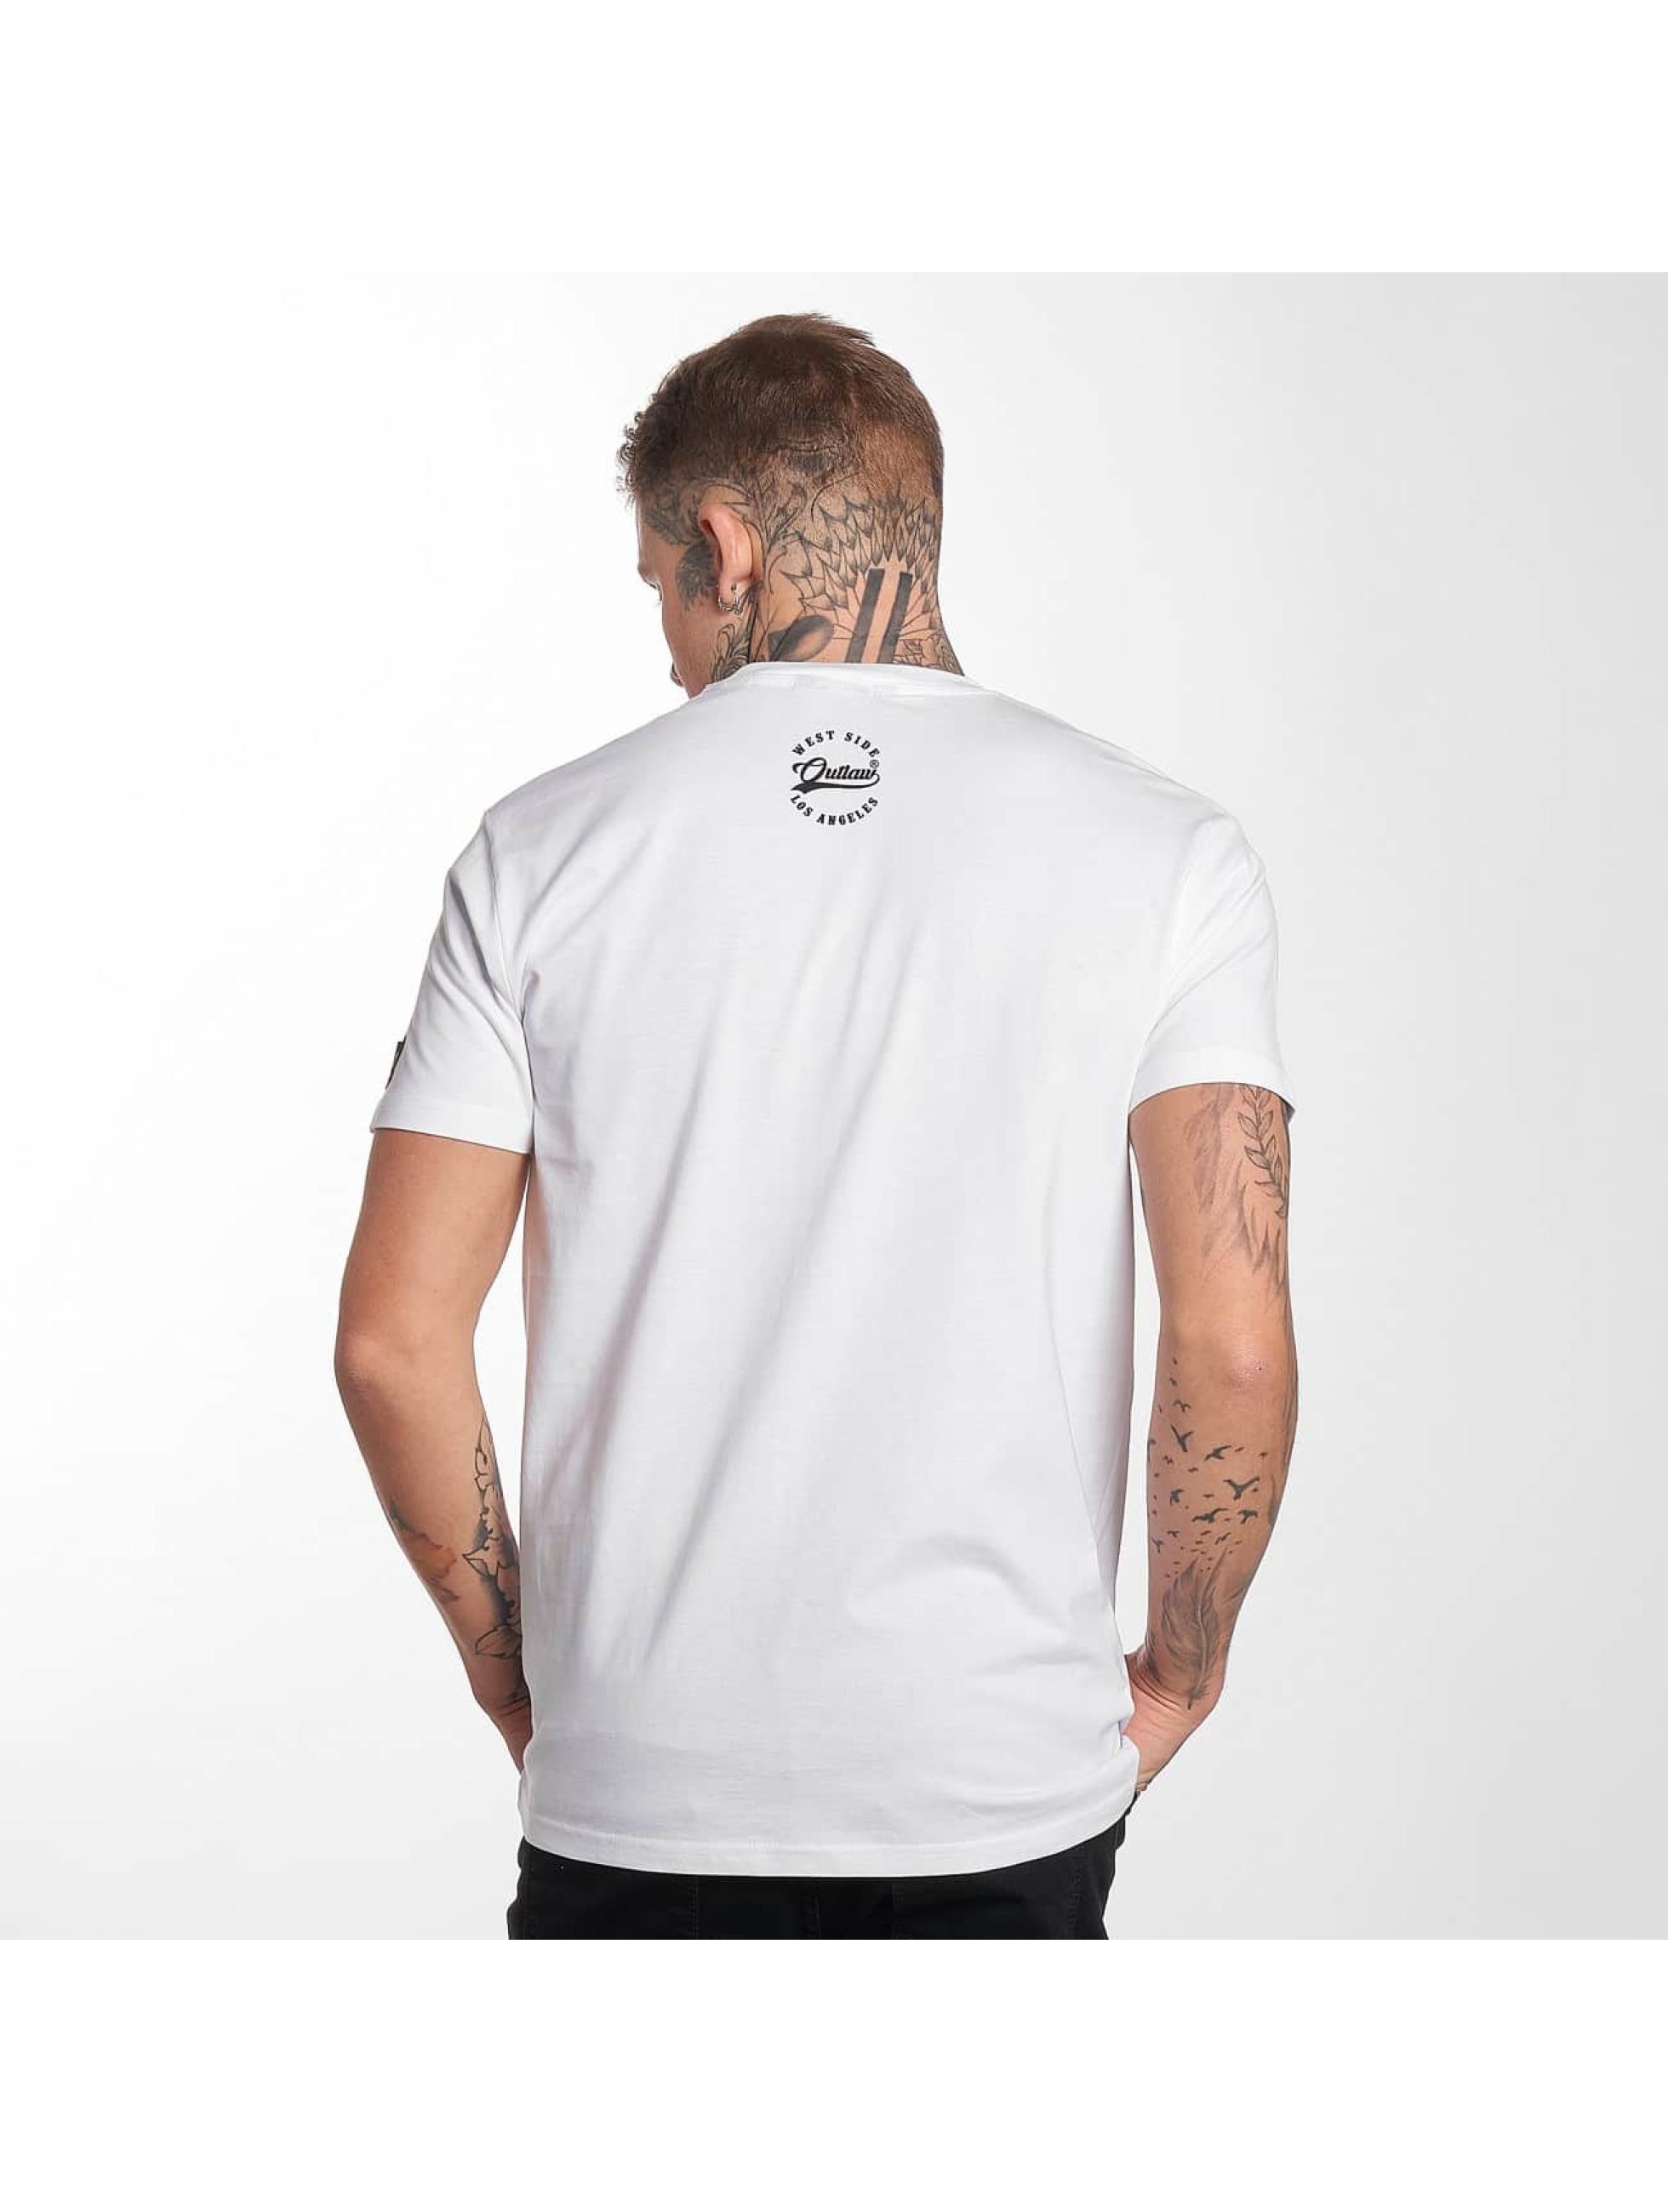 Outlaw T-Shirt Outlaw T-Shirt blanc